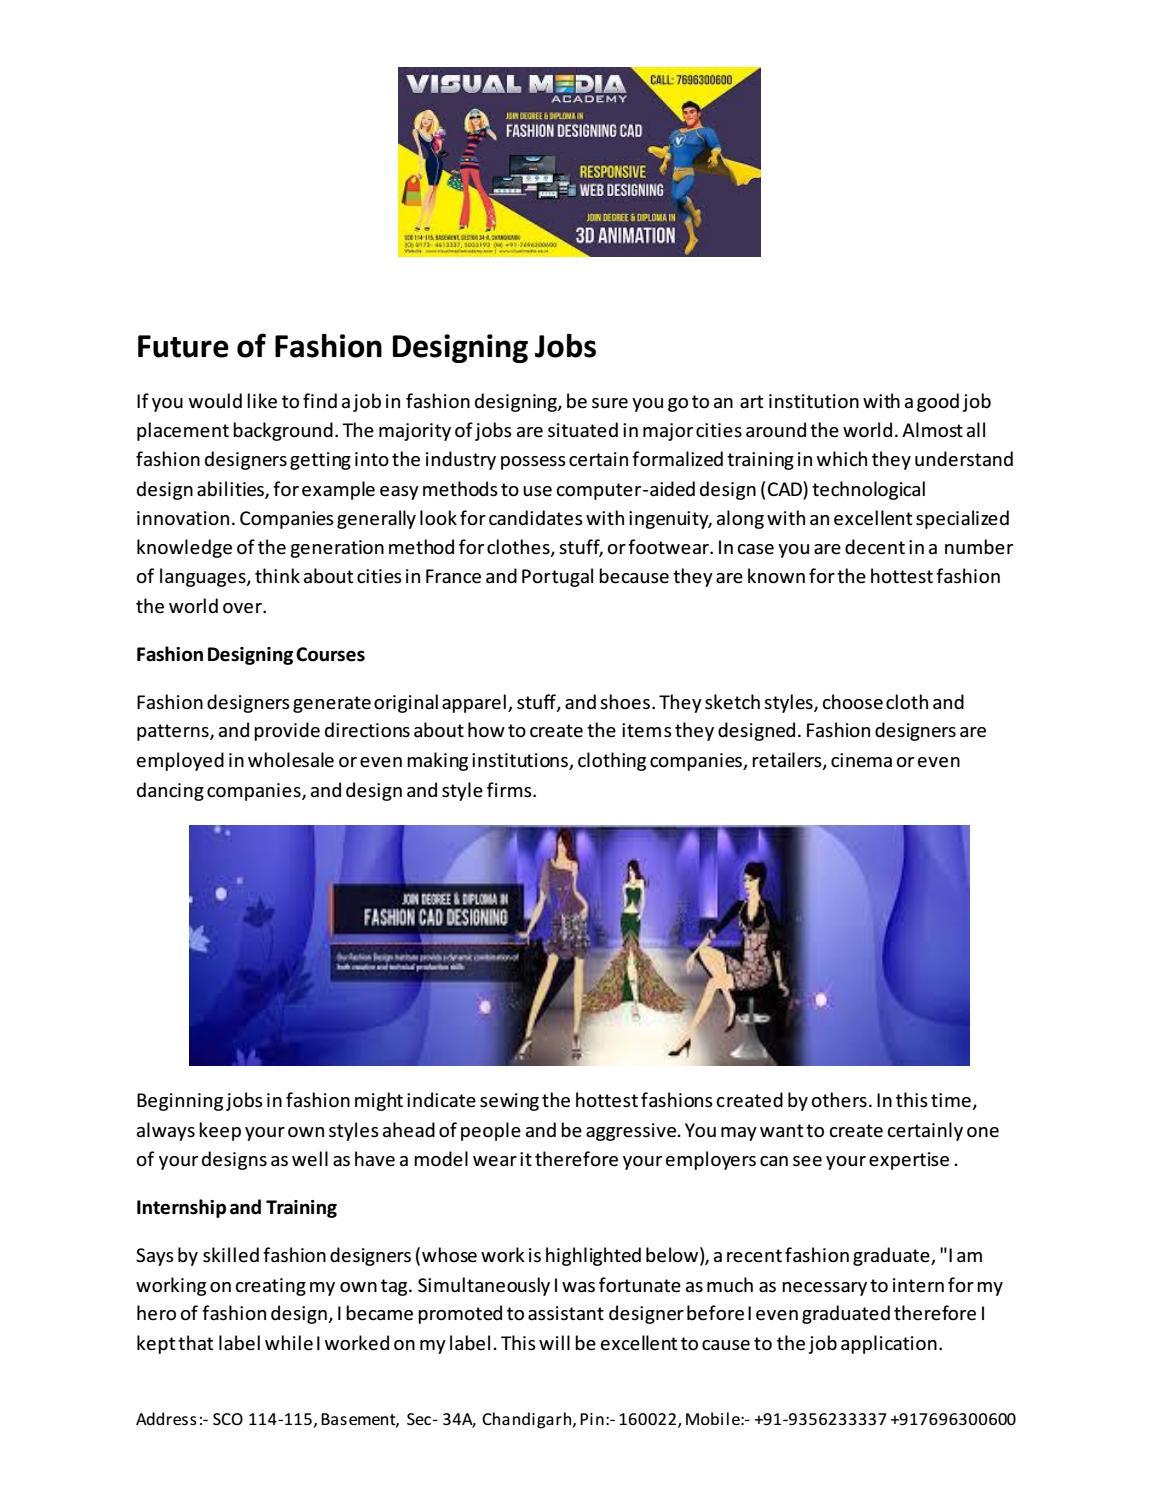 Fashion cad designer job description 91